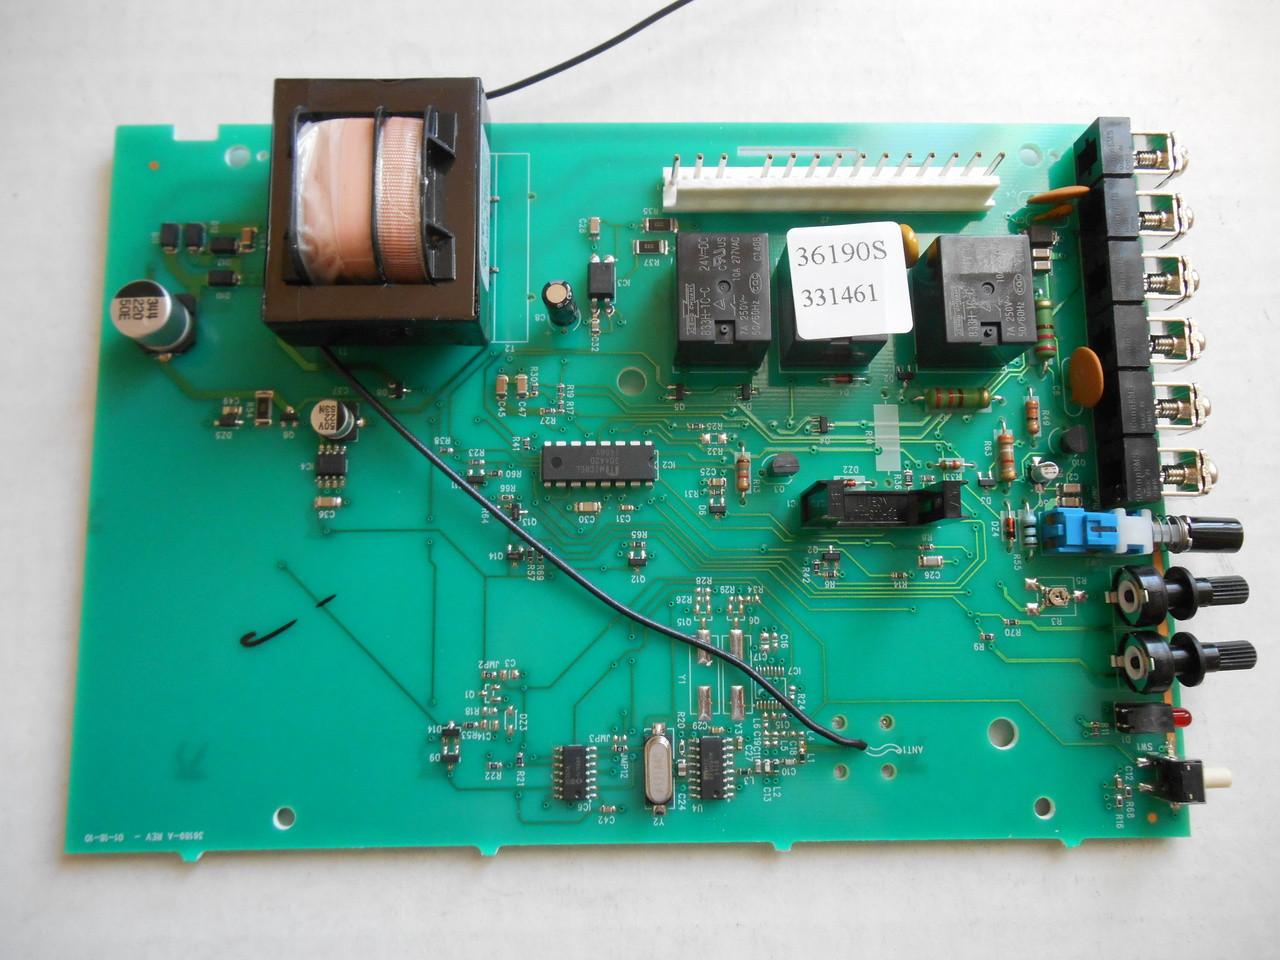 circuit board genie chainglide 20380s overhead door parts online genie pro max capacitor genie pro max circuit board wiring diagram [ 1280 x 960 Pixel ]